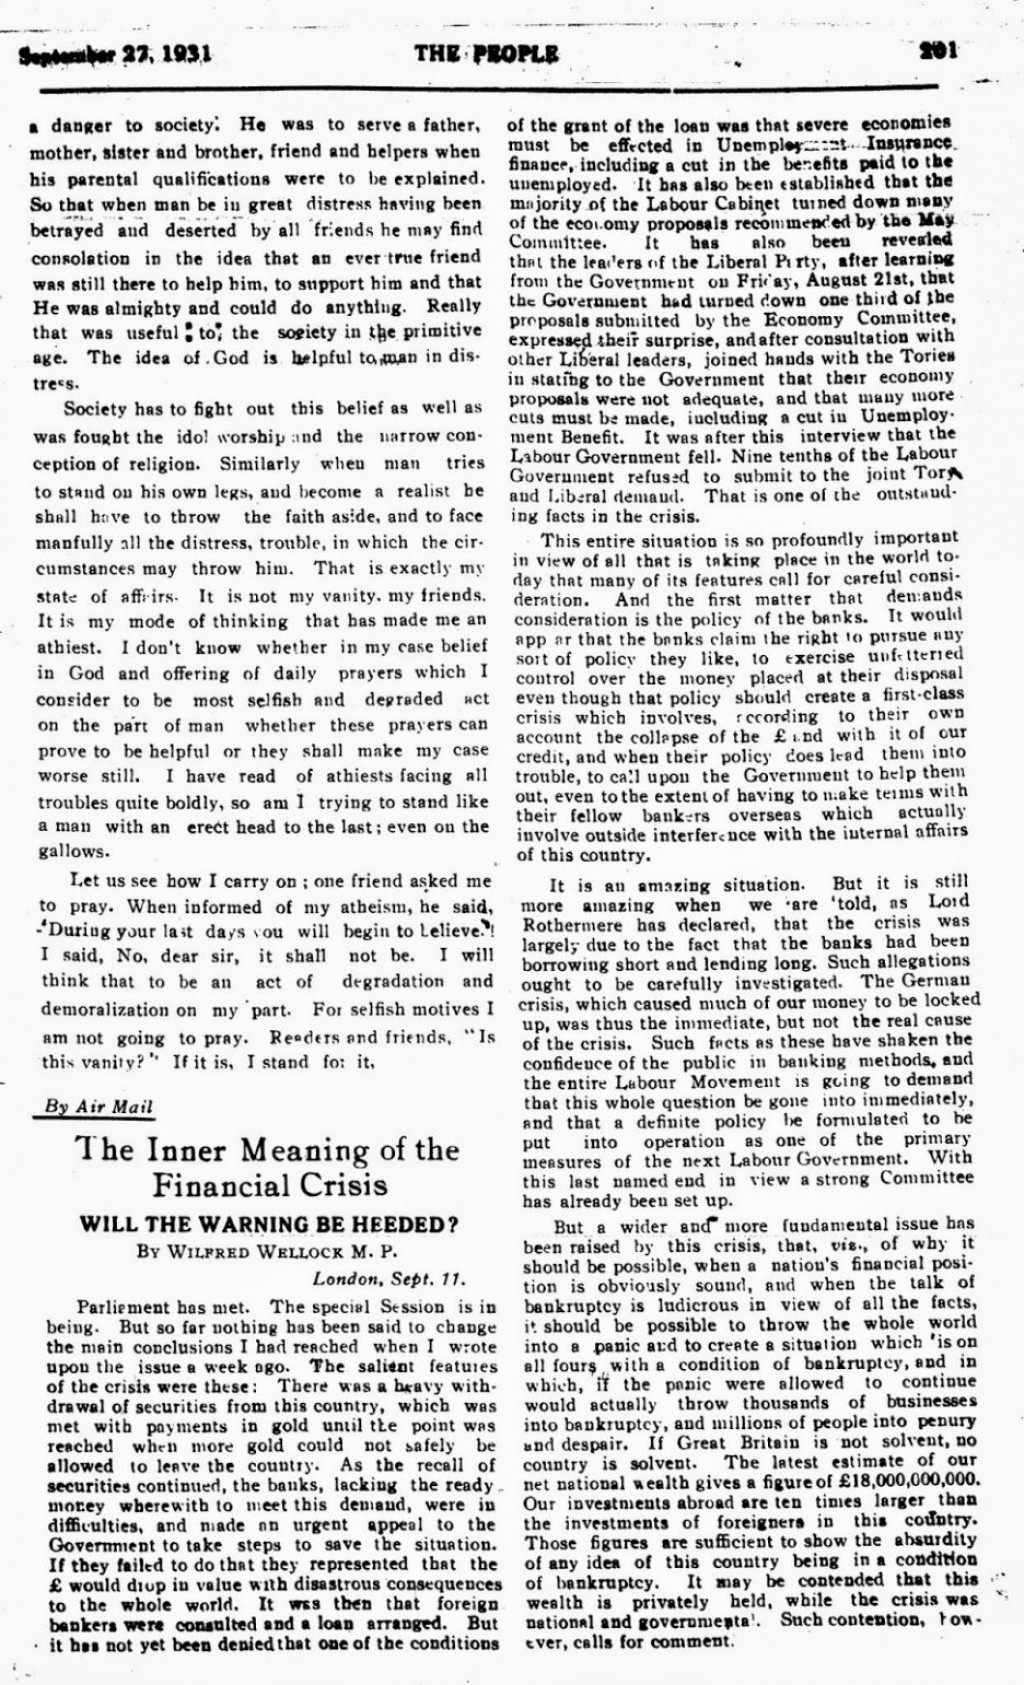 006 Essay On Bhagat Singh In Marathi Urdu Punjabi Kannada Telugu Hindi Sanskrit English Language Words Short 936x1541 Unique 100 Large